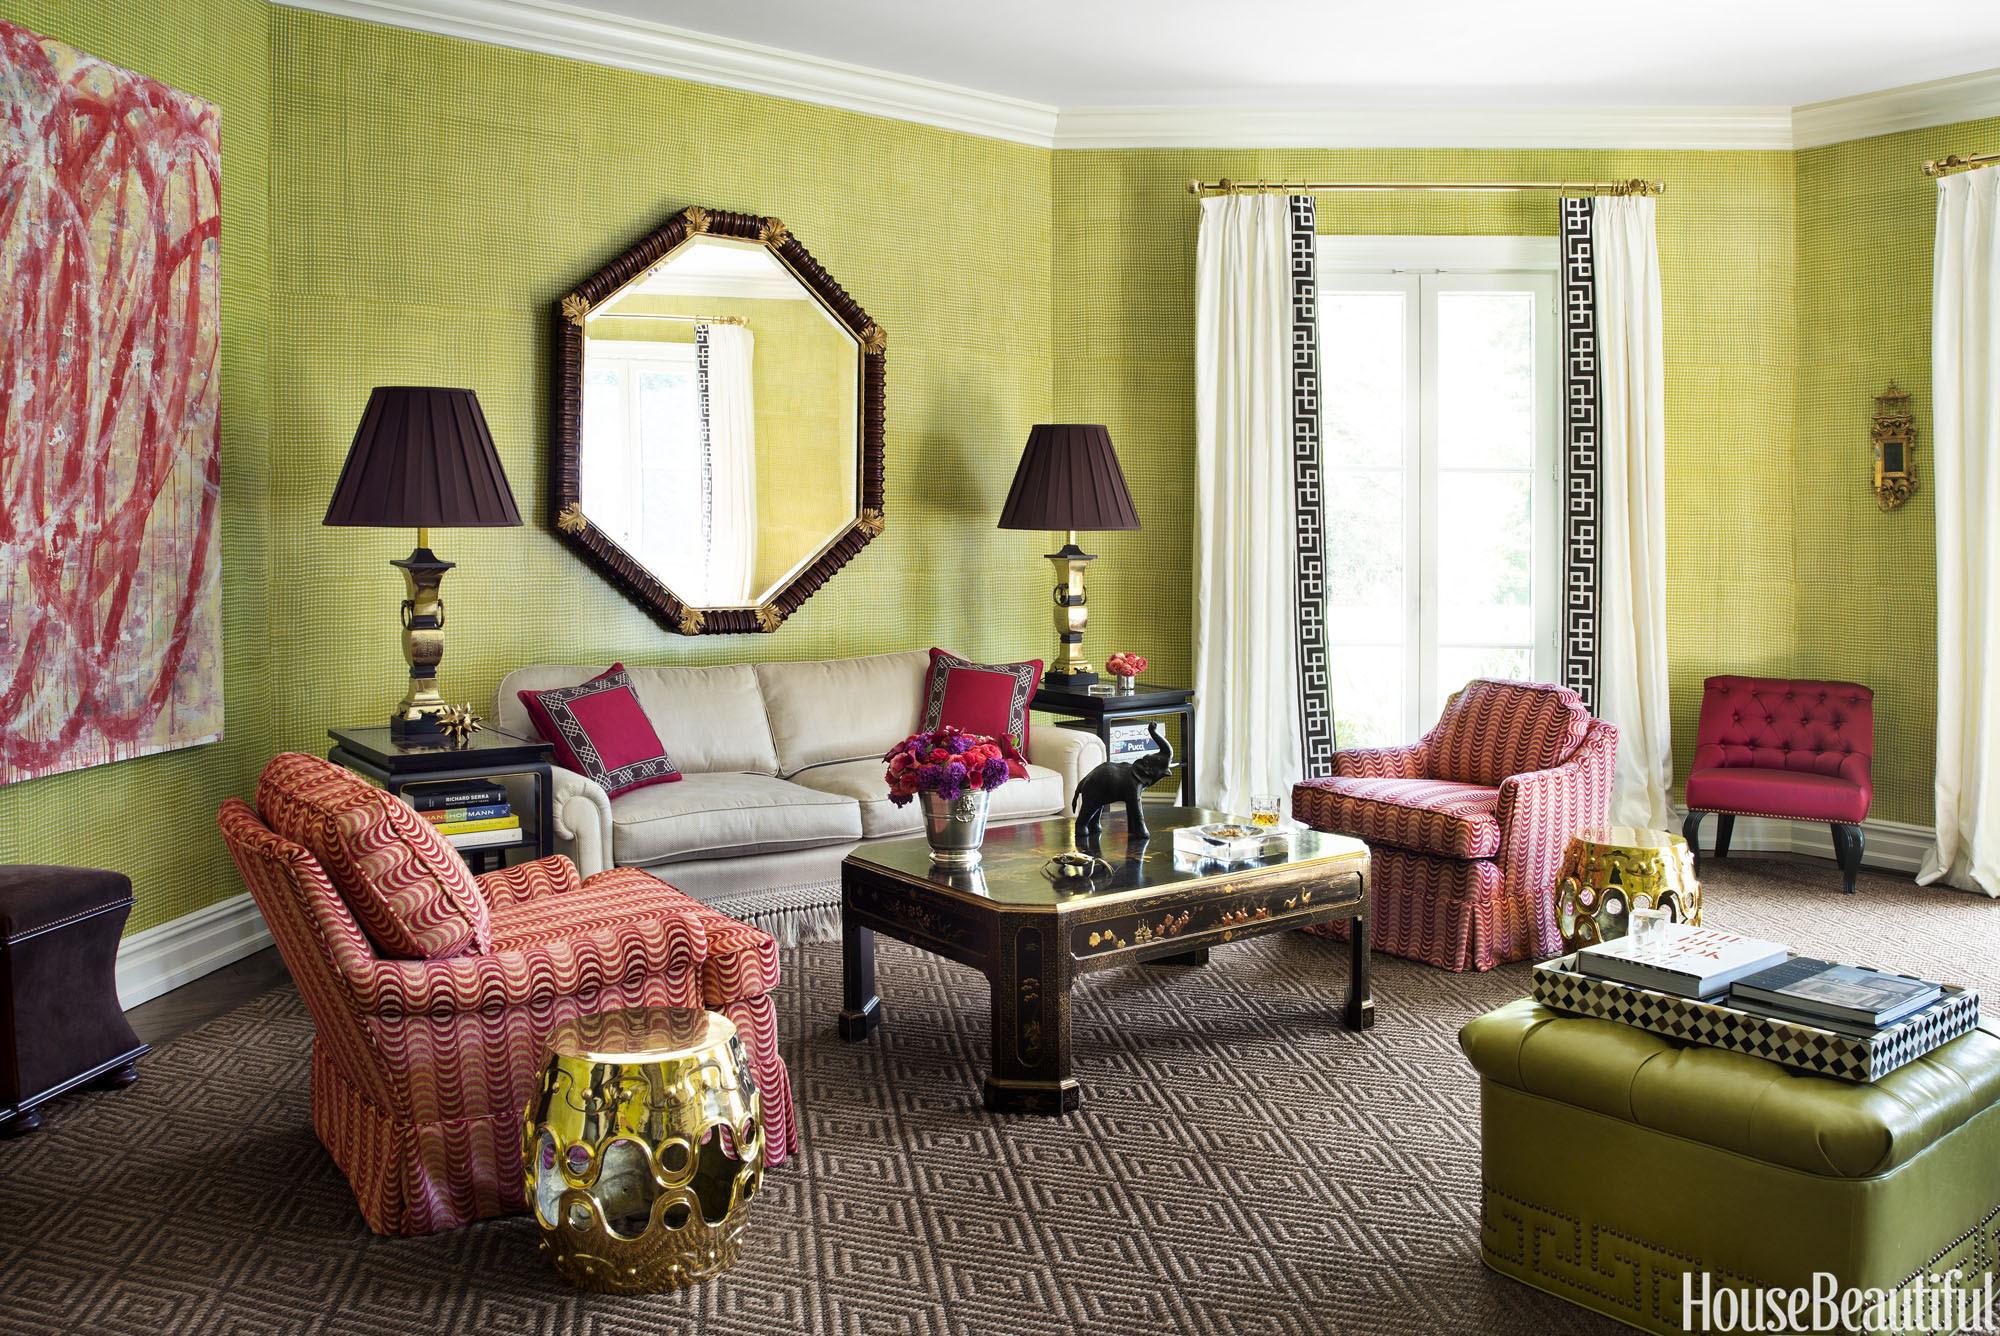 Living Room Decorating Ideas Living Room Designs - 26 Most Adorable Living Room Interior Design Decoration Channel